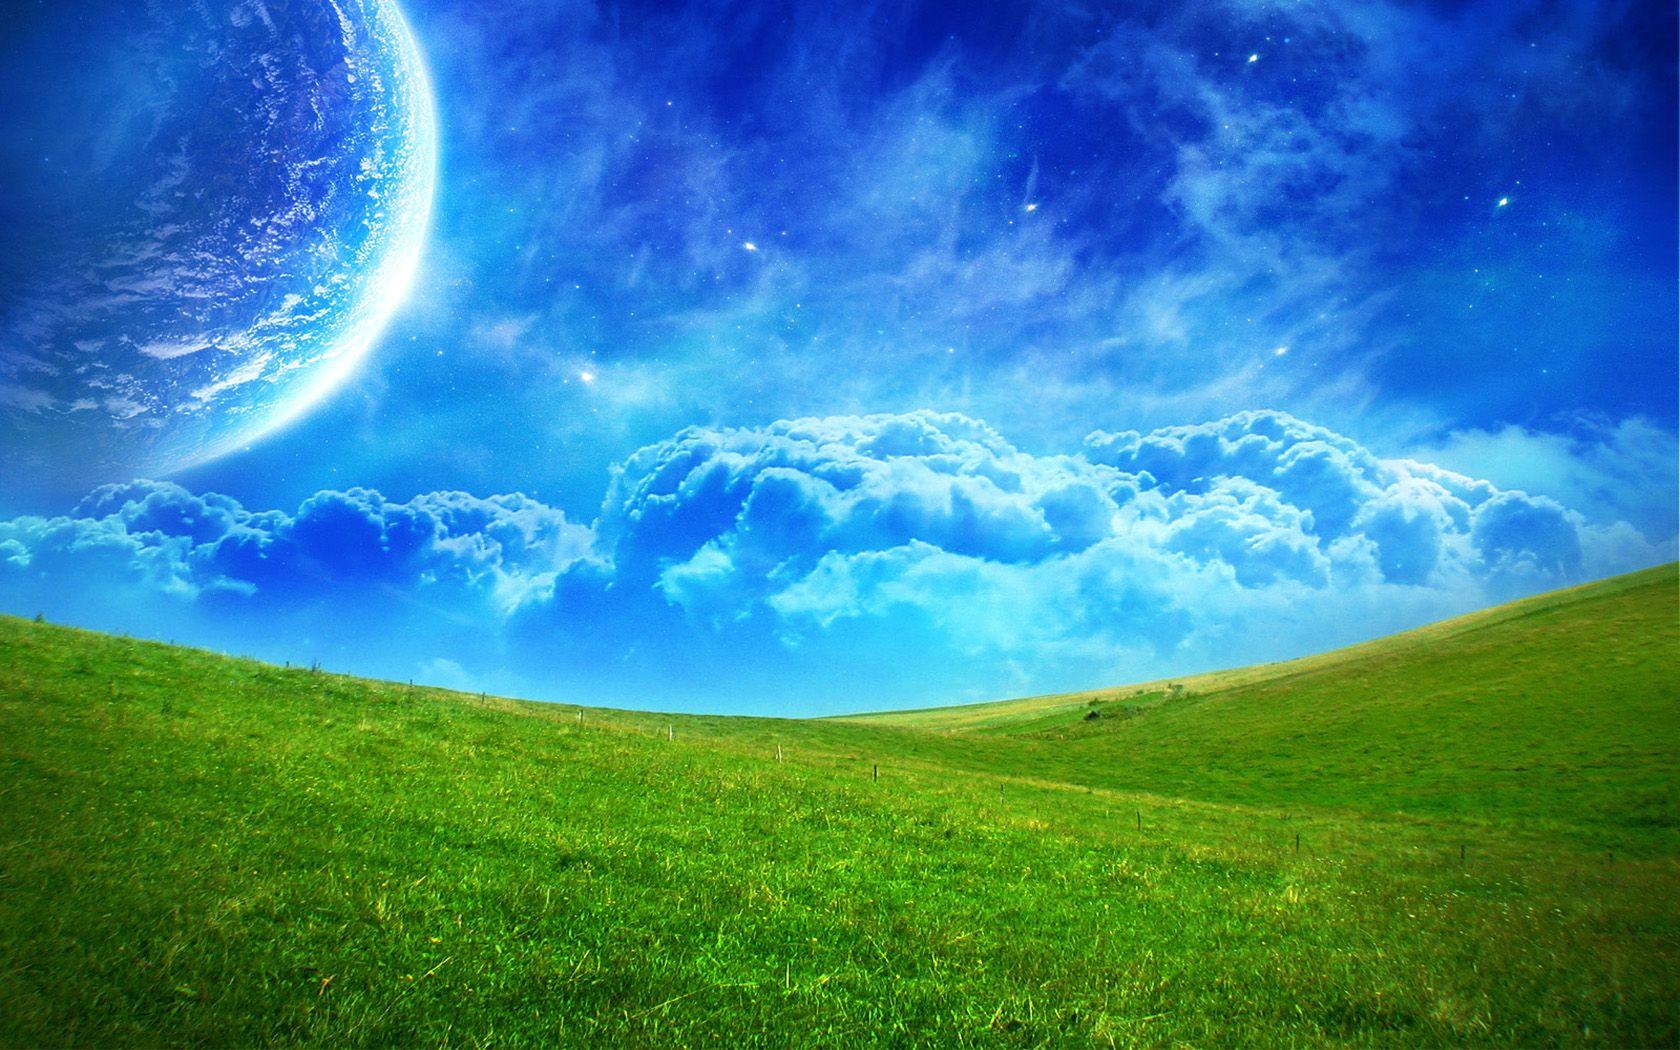 Beautiful Beautiful Landscape Wallpaper Landscape Wallpaper Background Hd Wallpaper